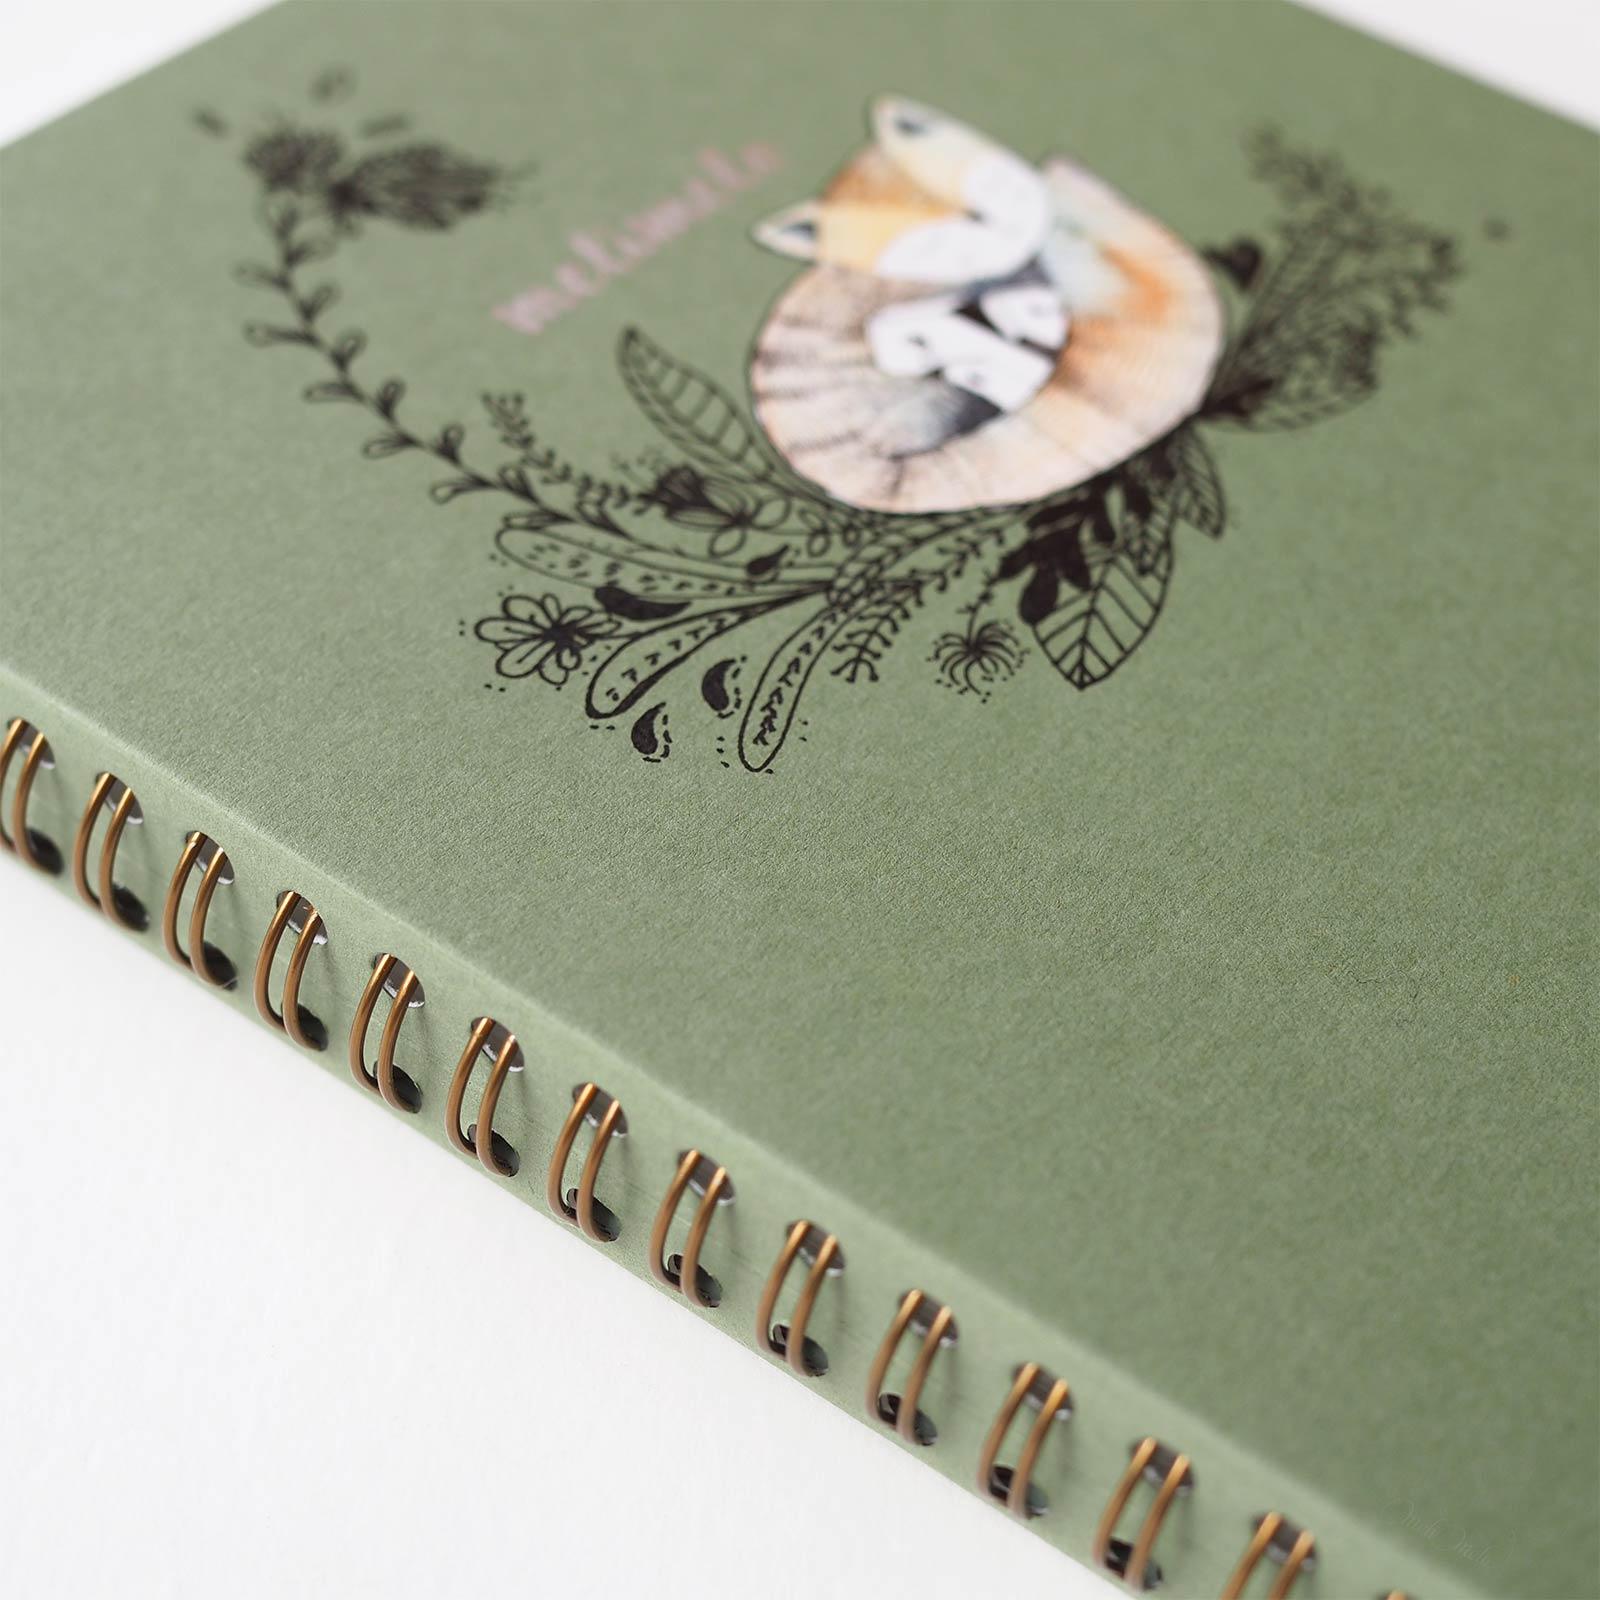 carnet aquarelle mossery sketchbook watercolor renard roux laboutiquedemelimelo